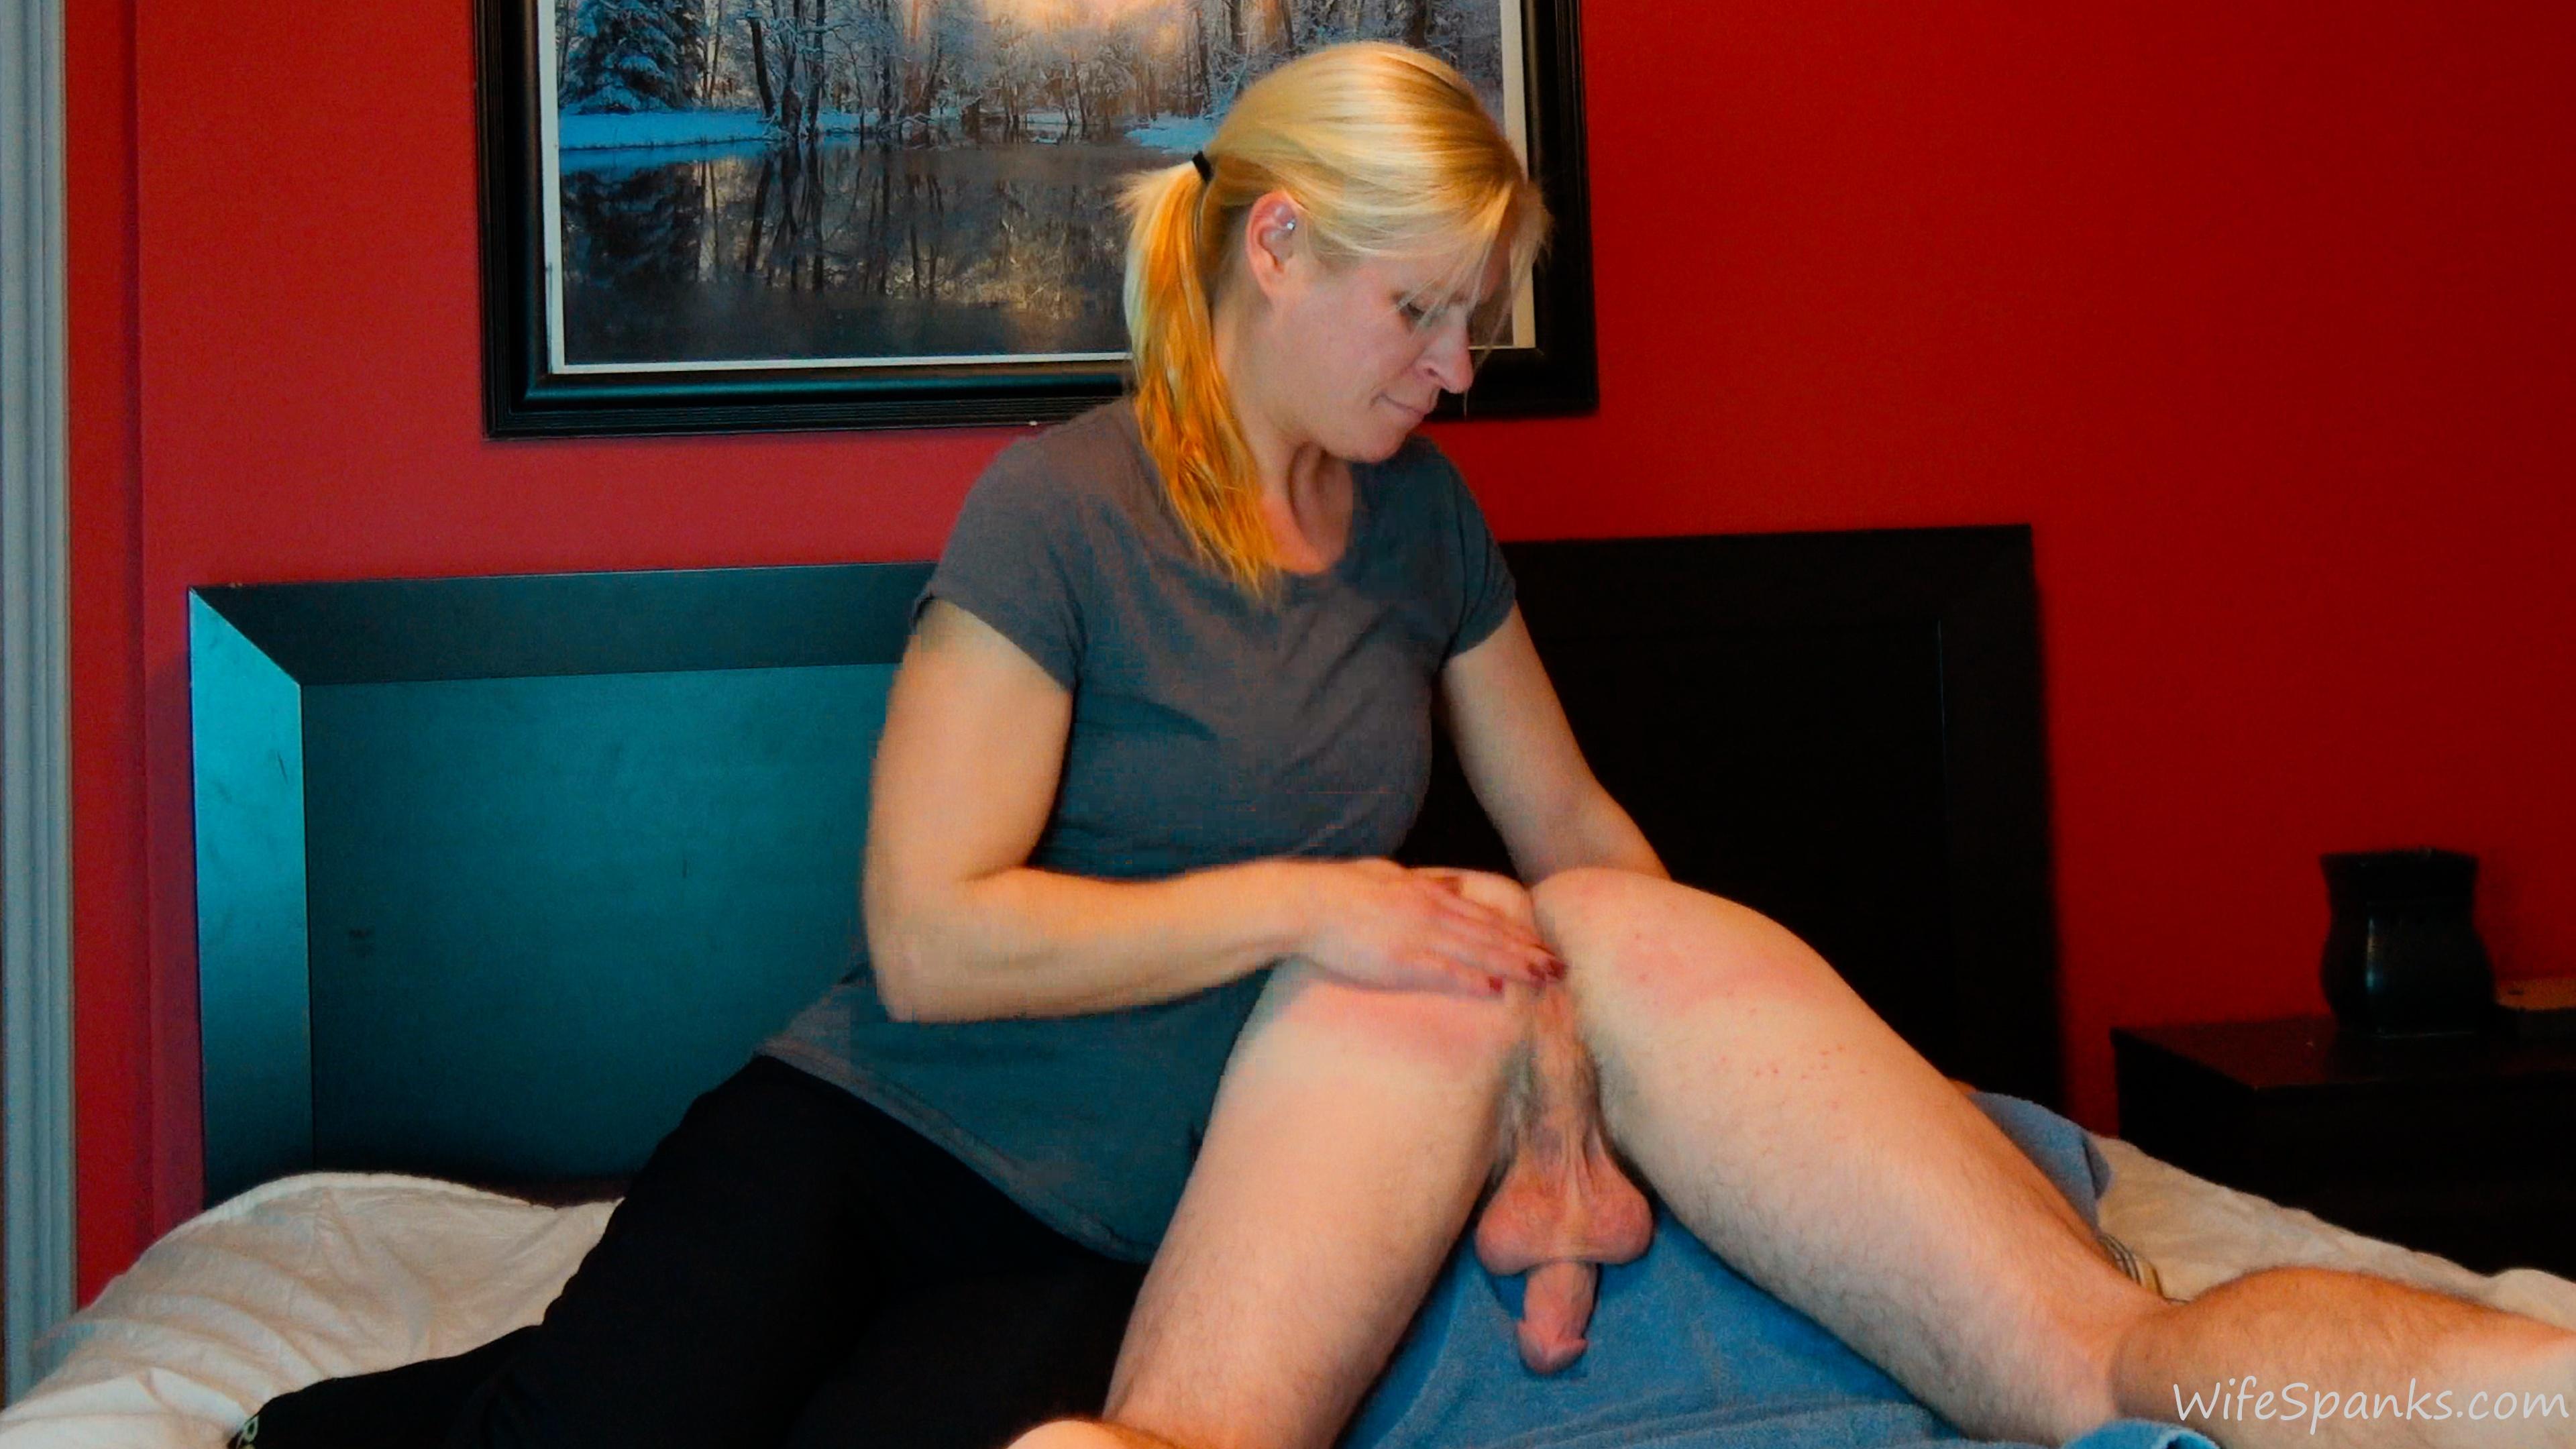 femdom-stepmom-spanks-boystory